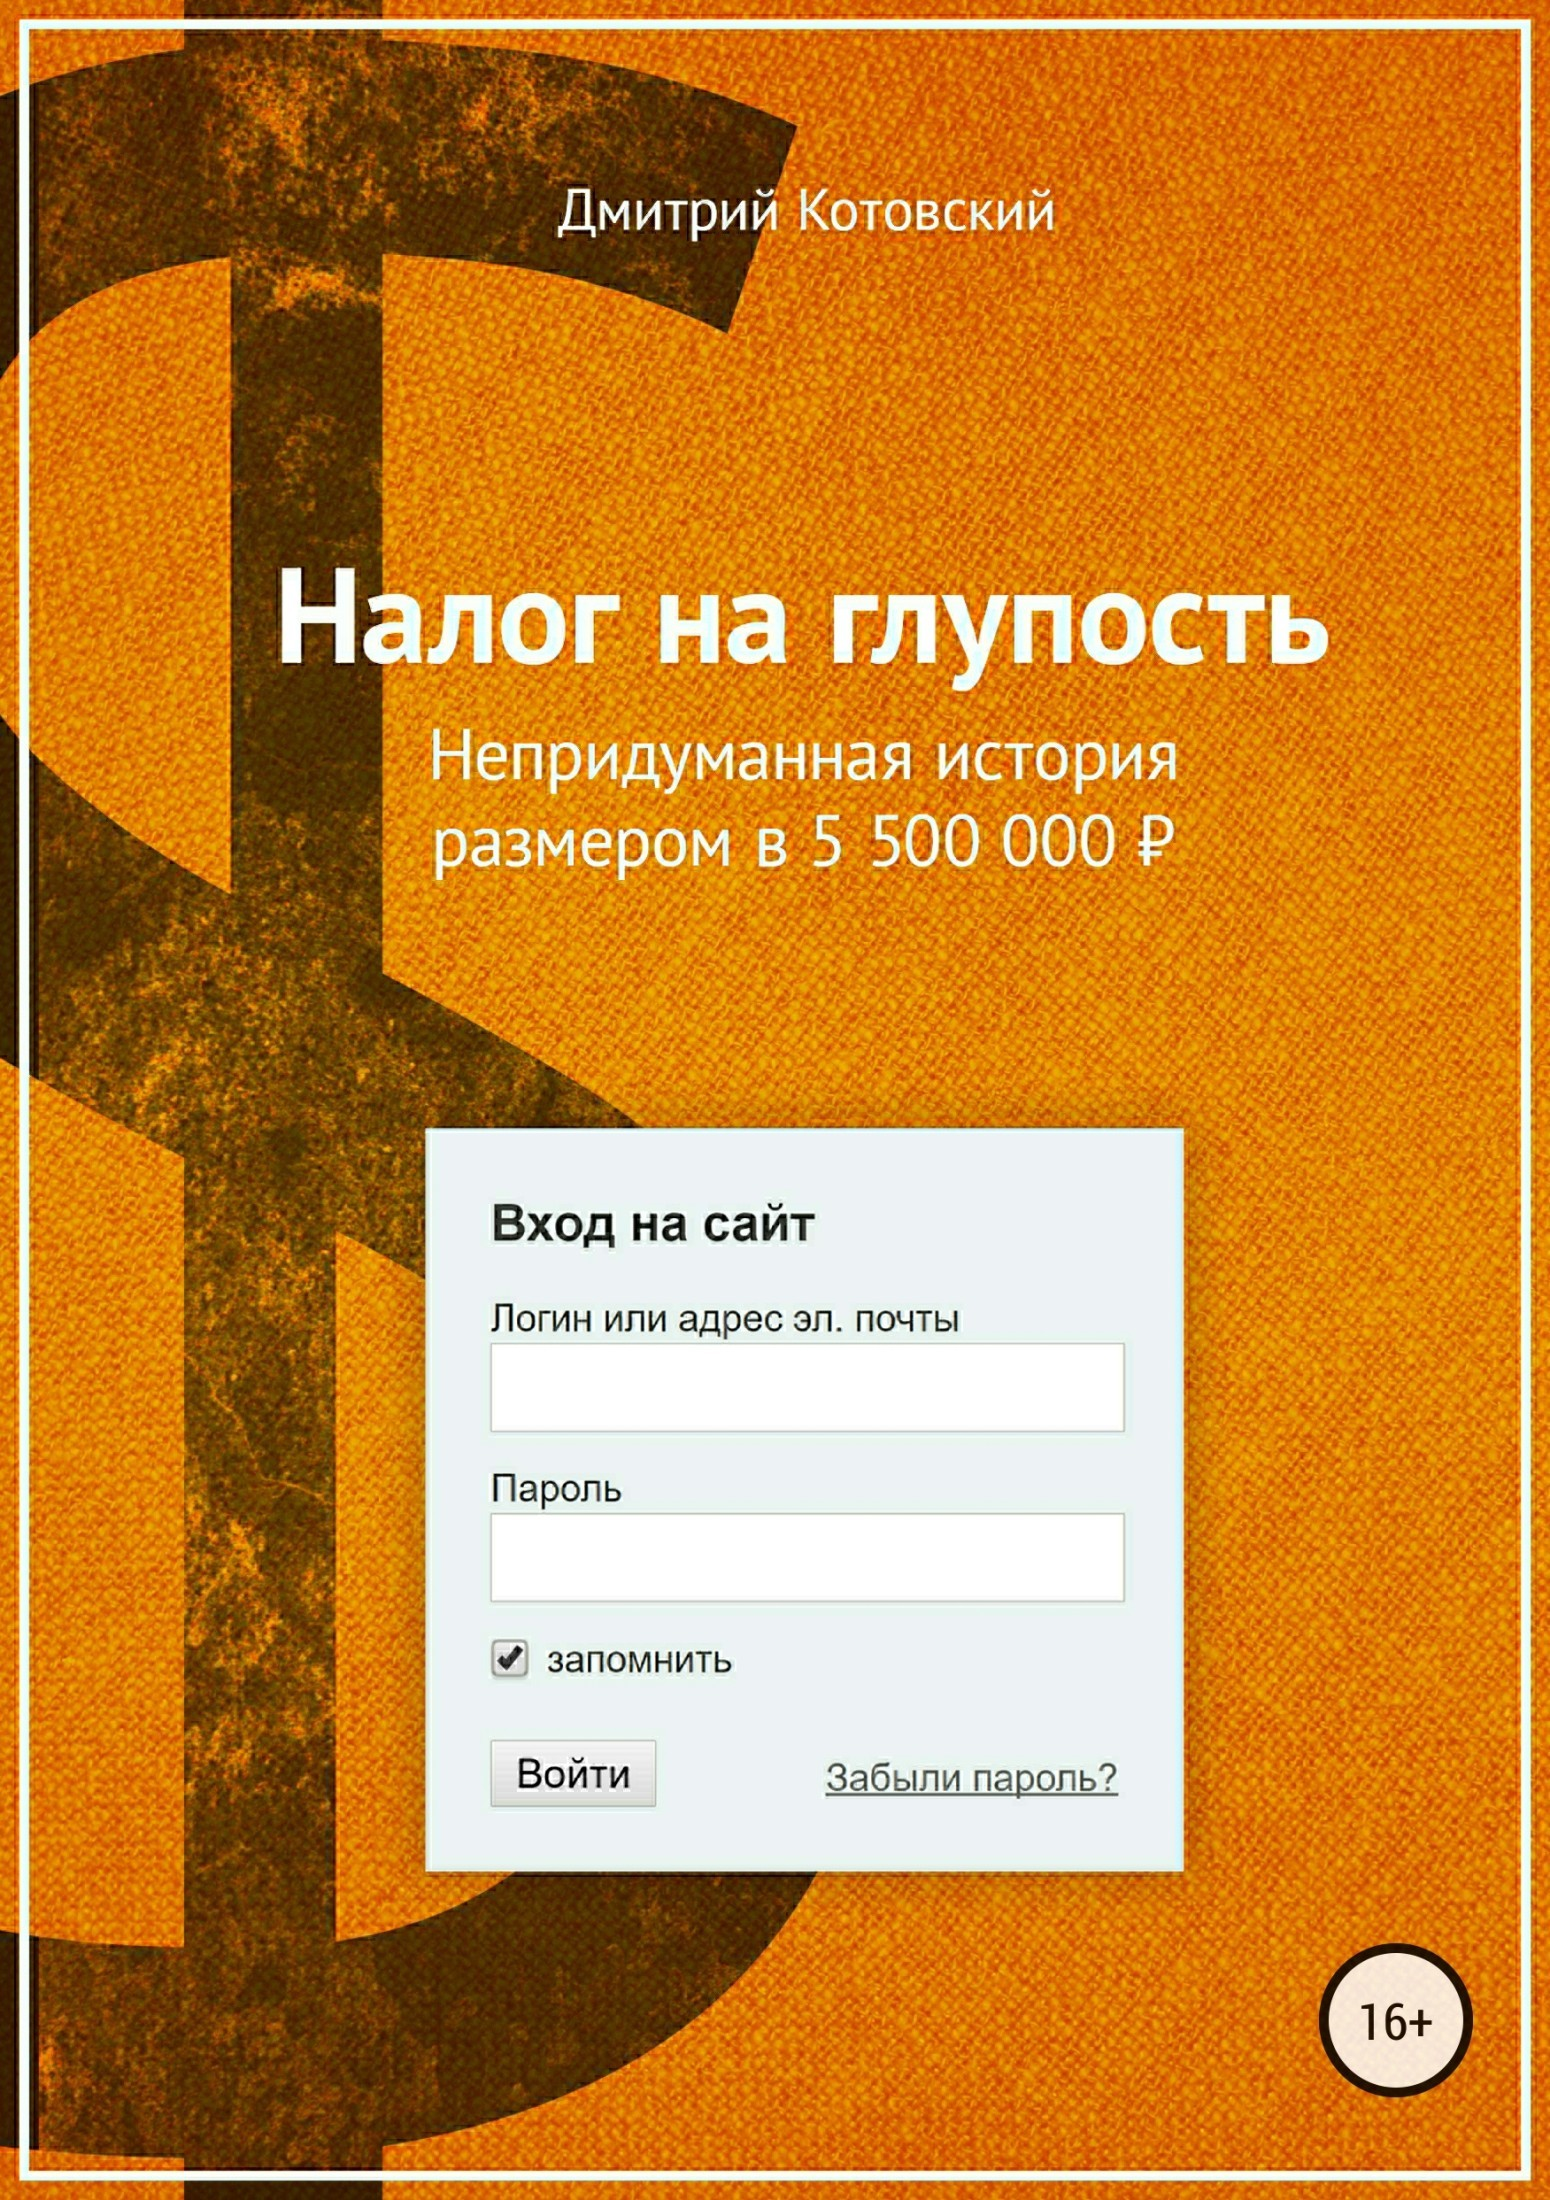 Дмитрий Котовский Налог на глупость какую машину до 300000 рублей в муроме